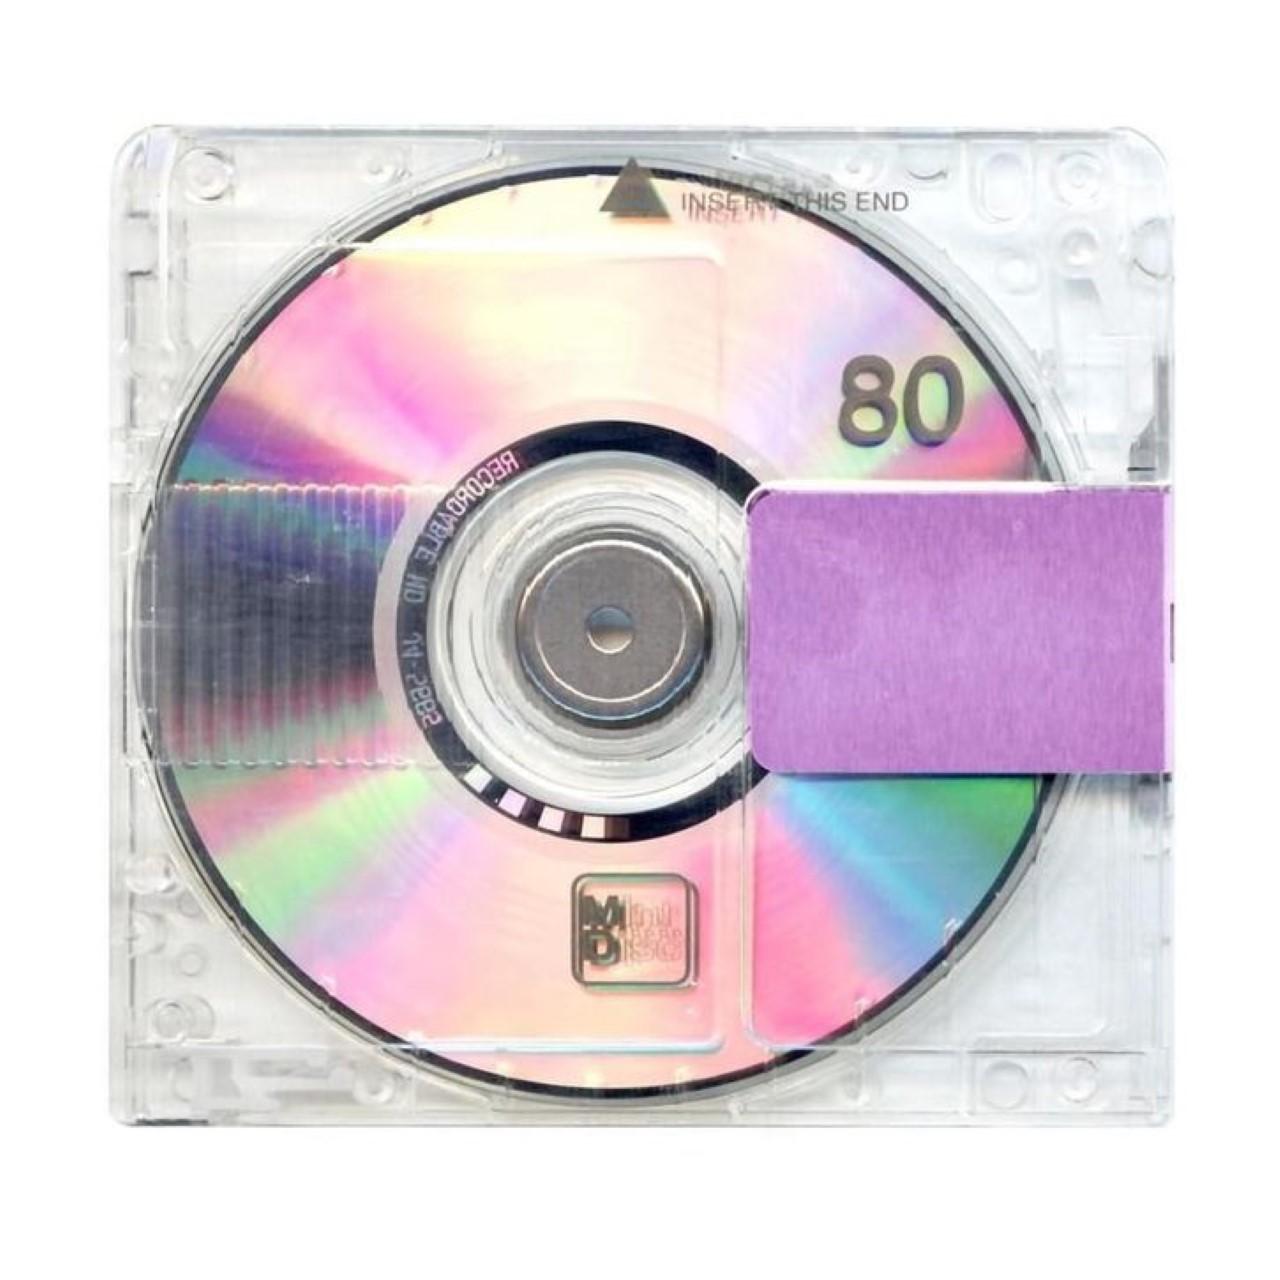 Kanye West - Yandhi201007